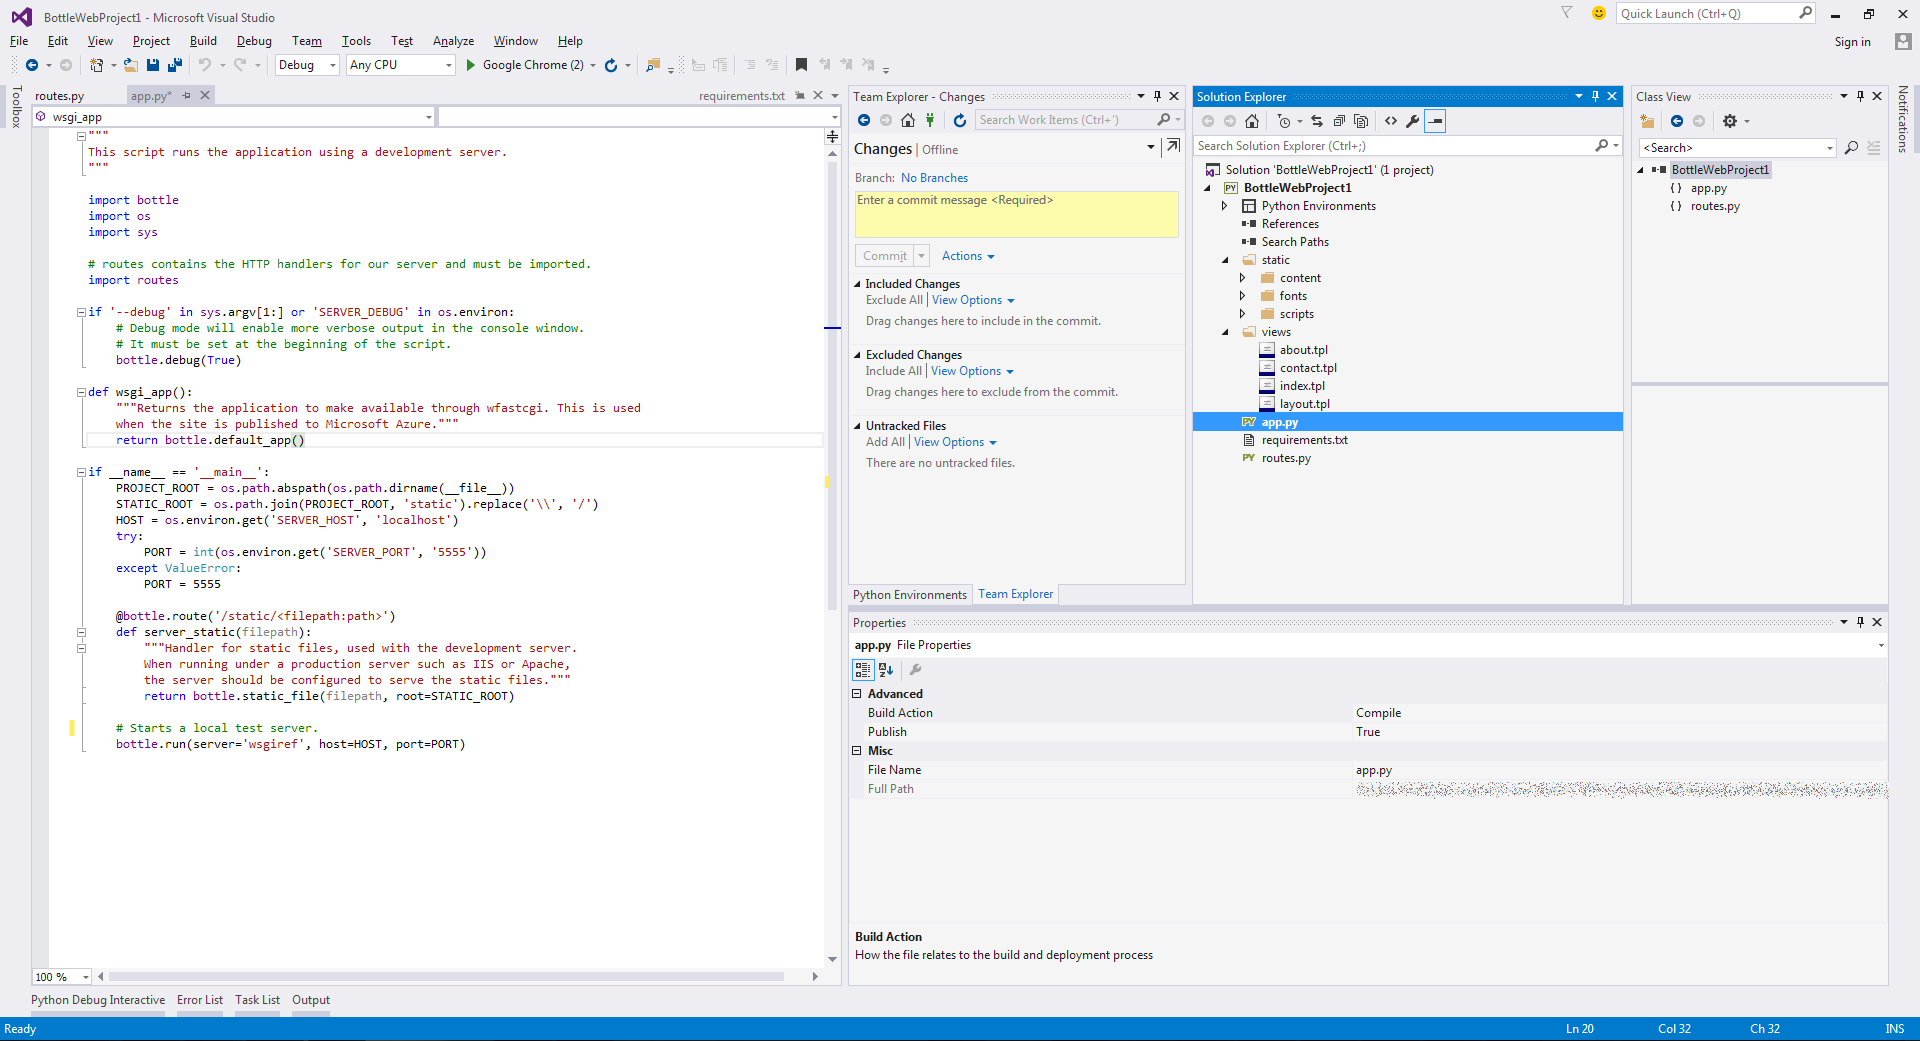 enable codelens visual studio 2017 community